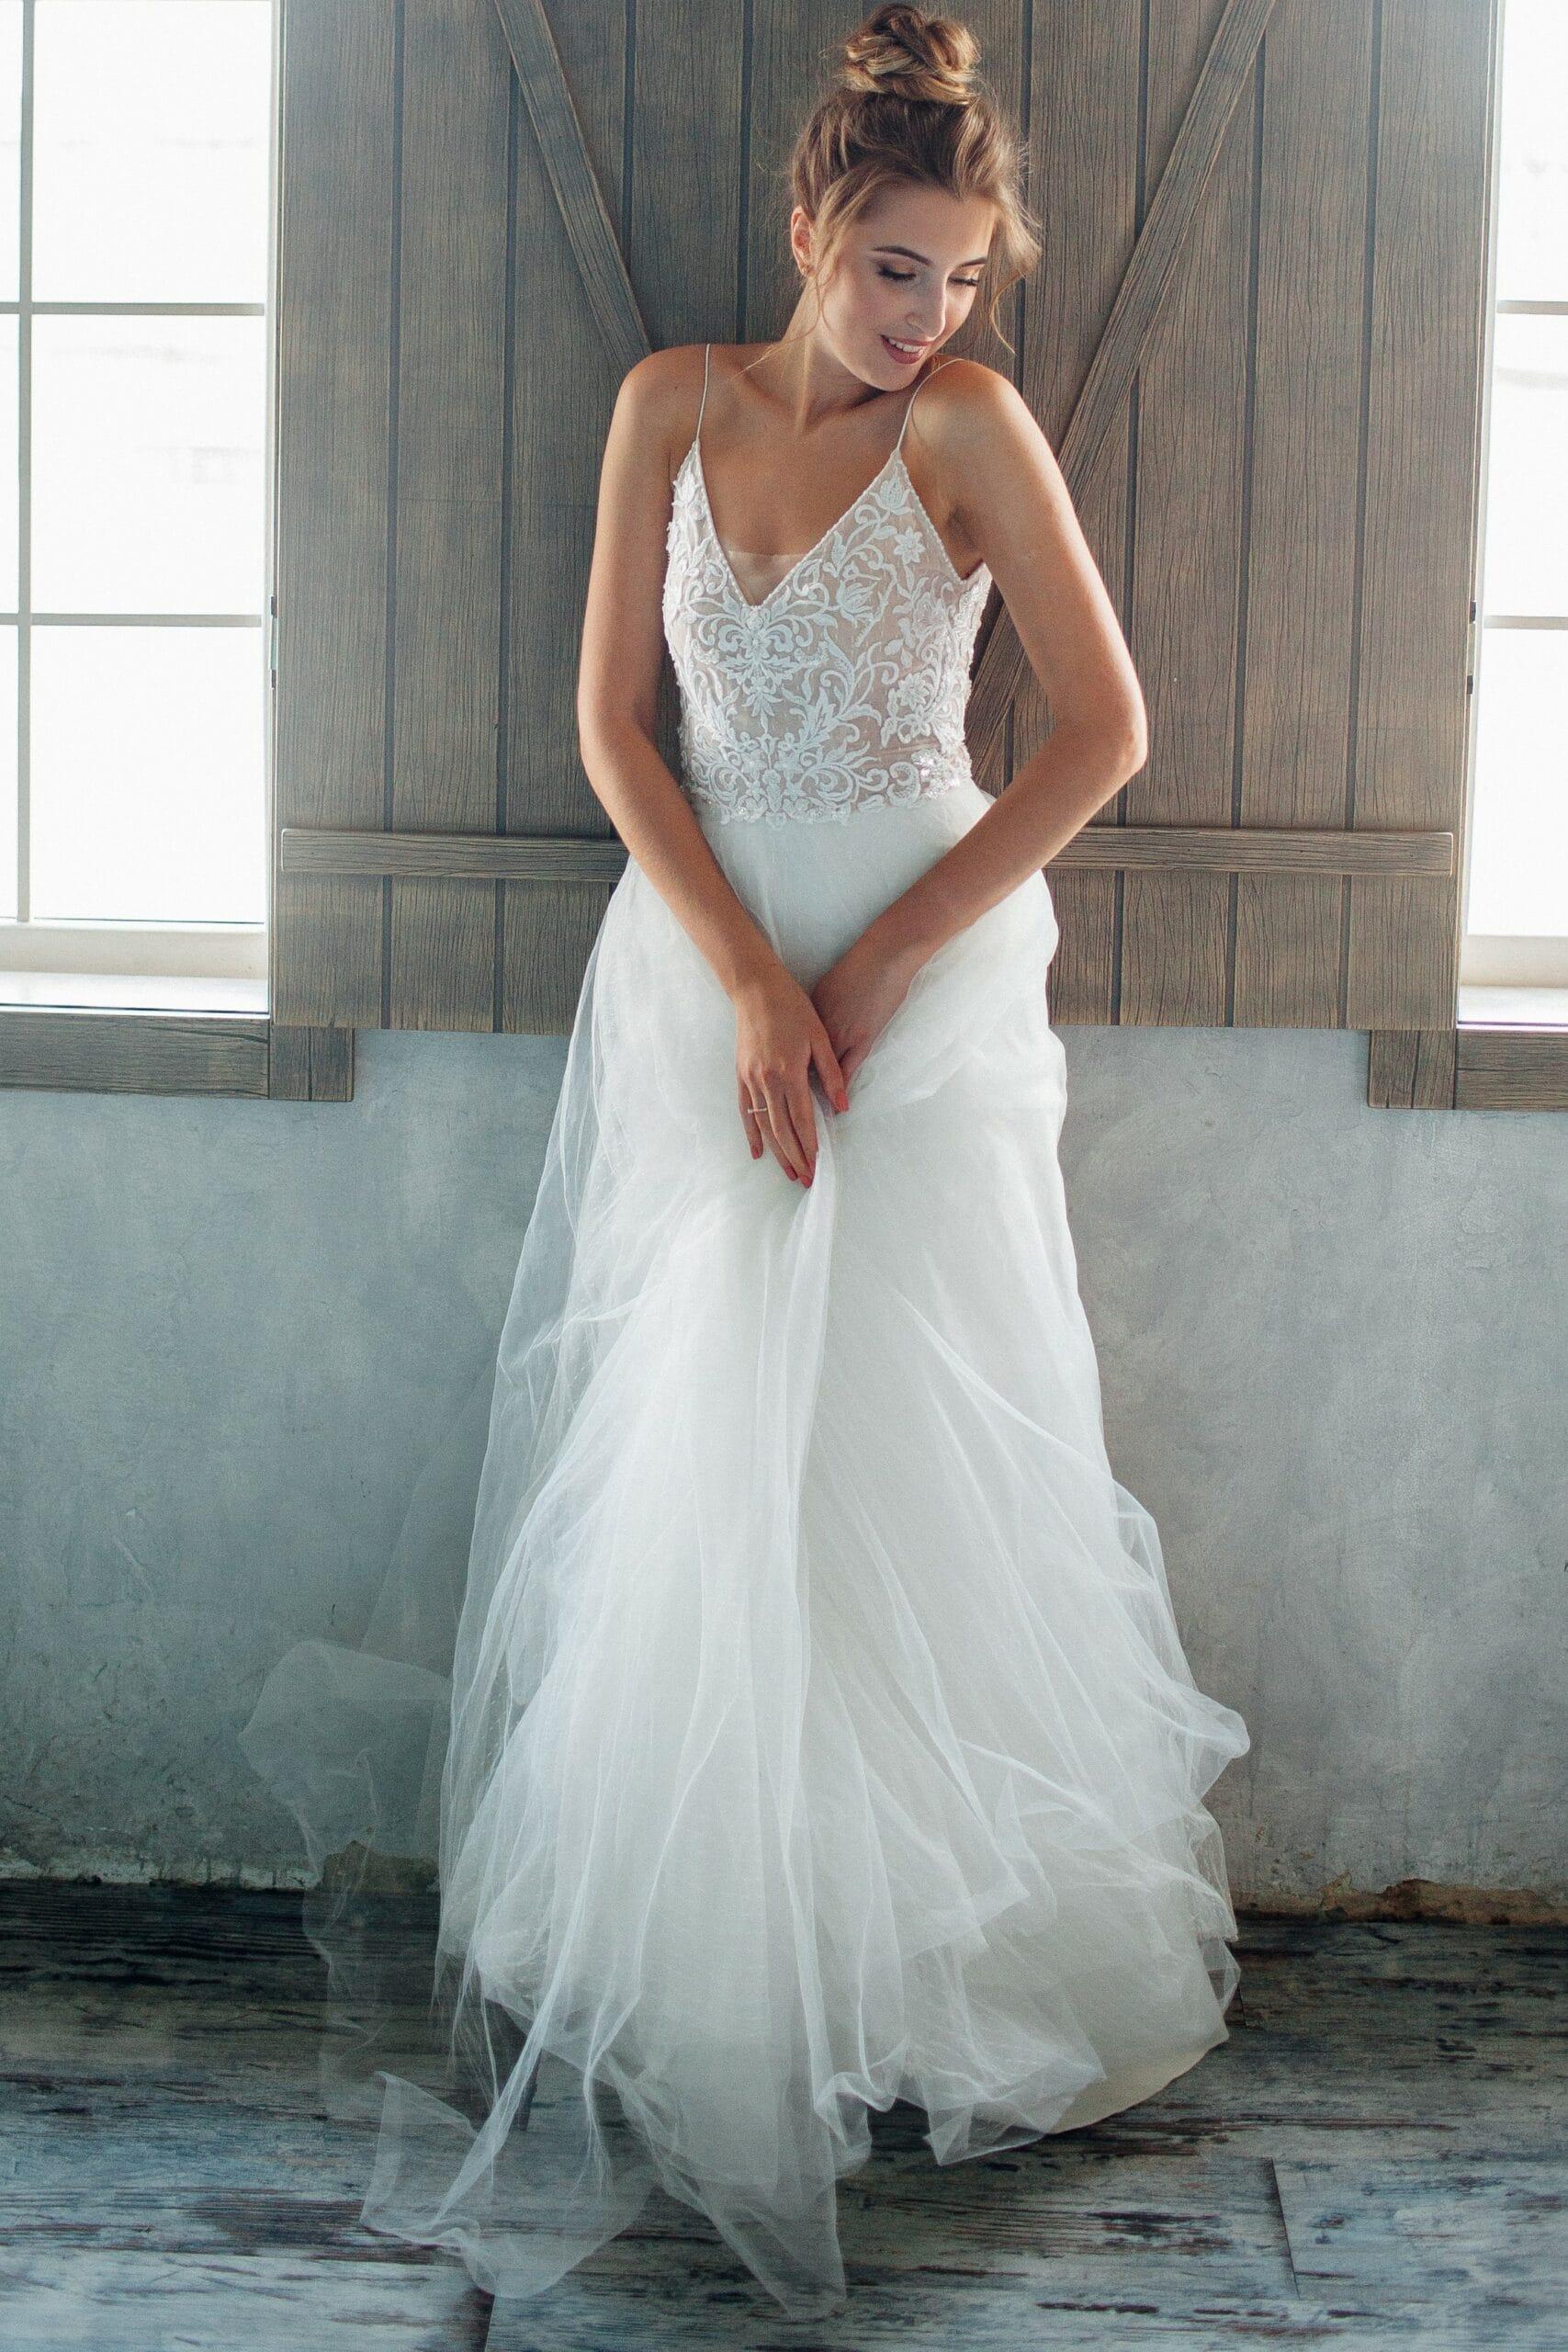 Свадебное платье ASTER, коллекция THE ANGELS, бренд RARE BRIDAL, фото 1